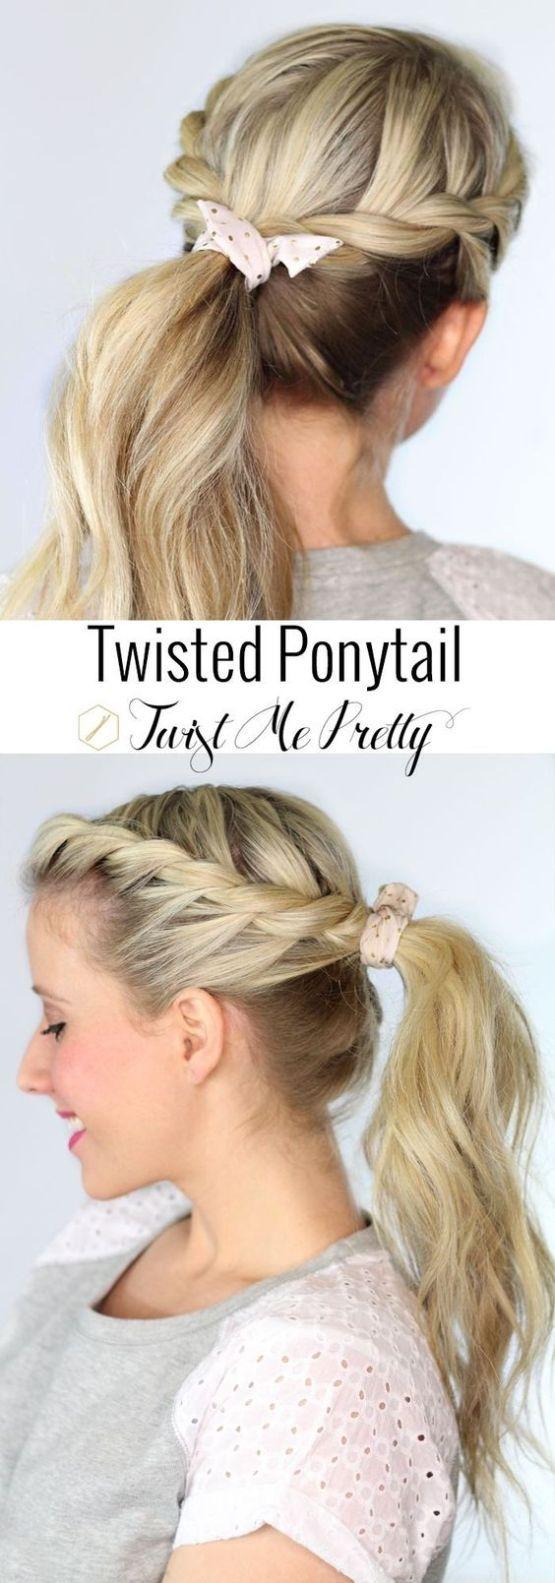 Cute hairstyles for school hairstyles pinterest easy